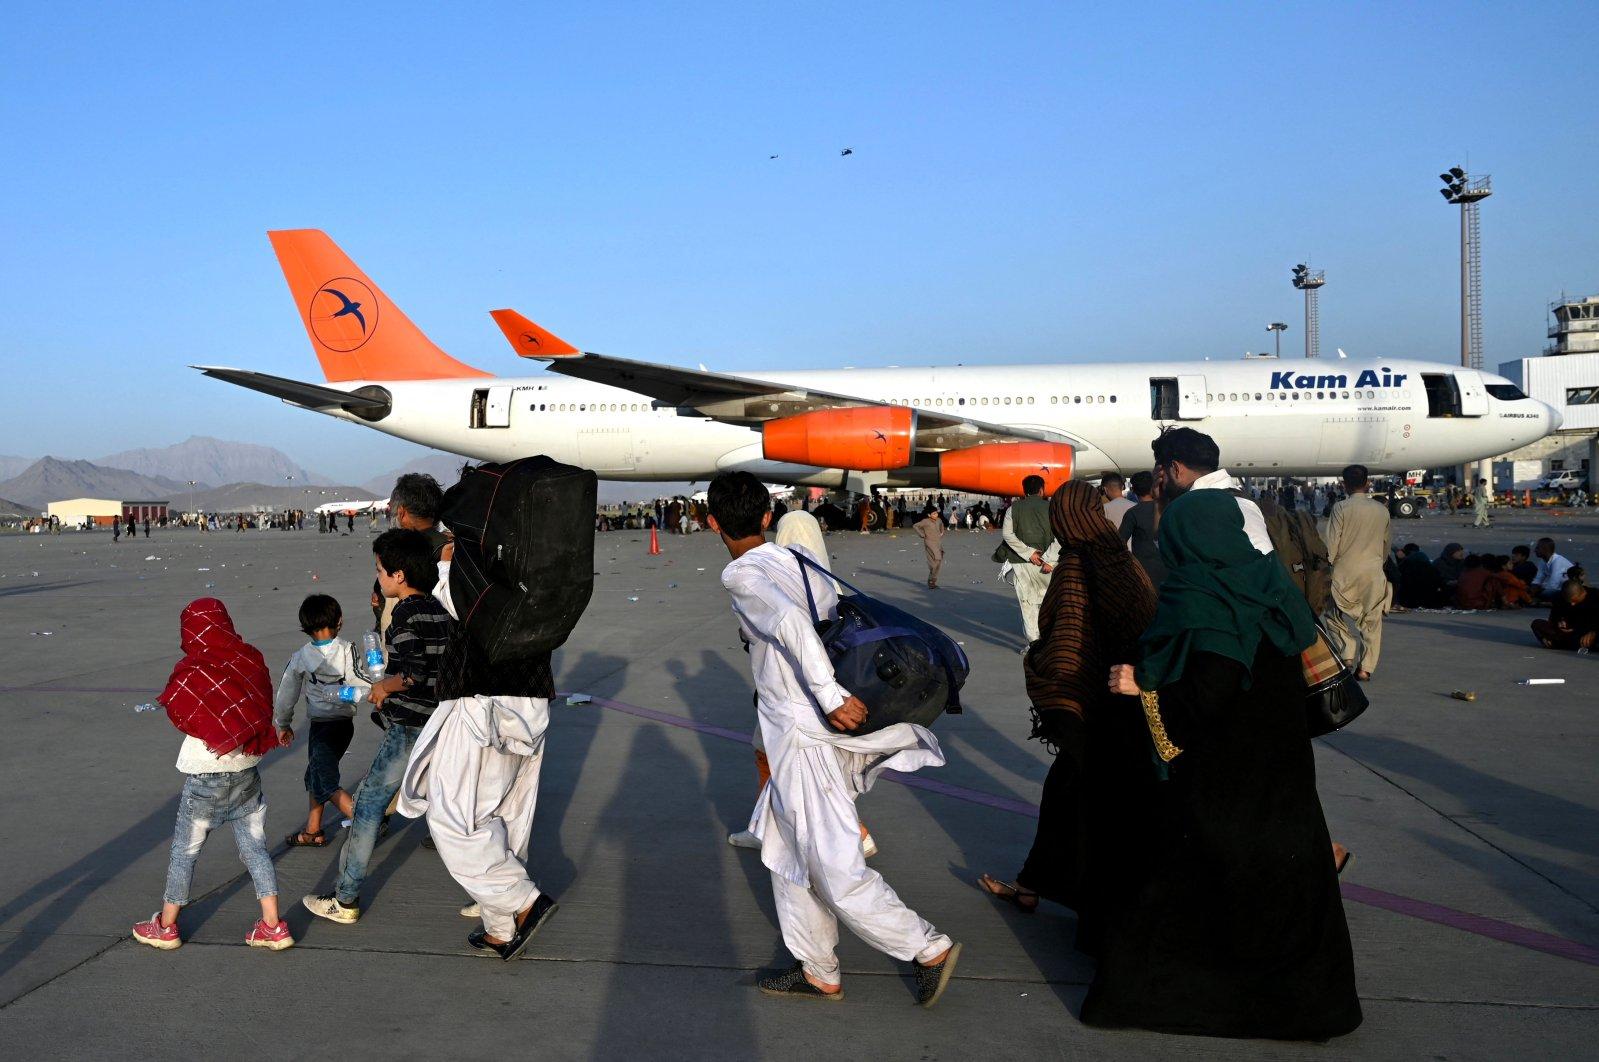 Afghan families walk by aircraft at Kabul Hamid Karzai International Airport, Kabul, Afghanistan, Aug. 16, 2021. (AFP Photo)